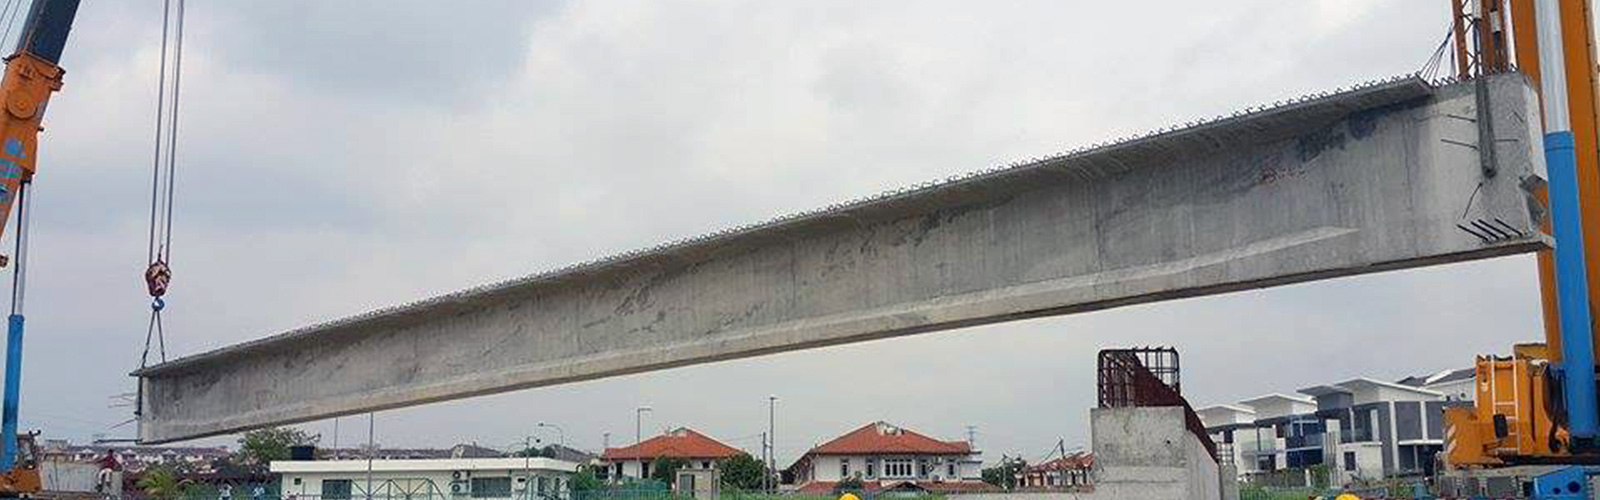 beam-banner1